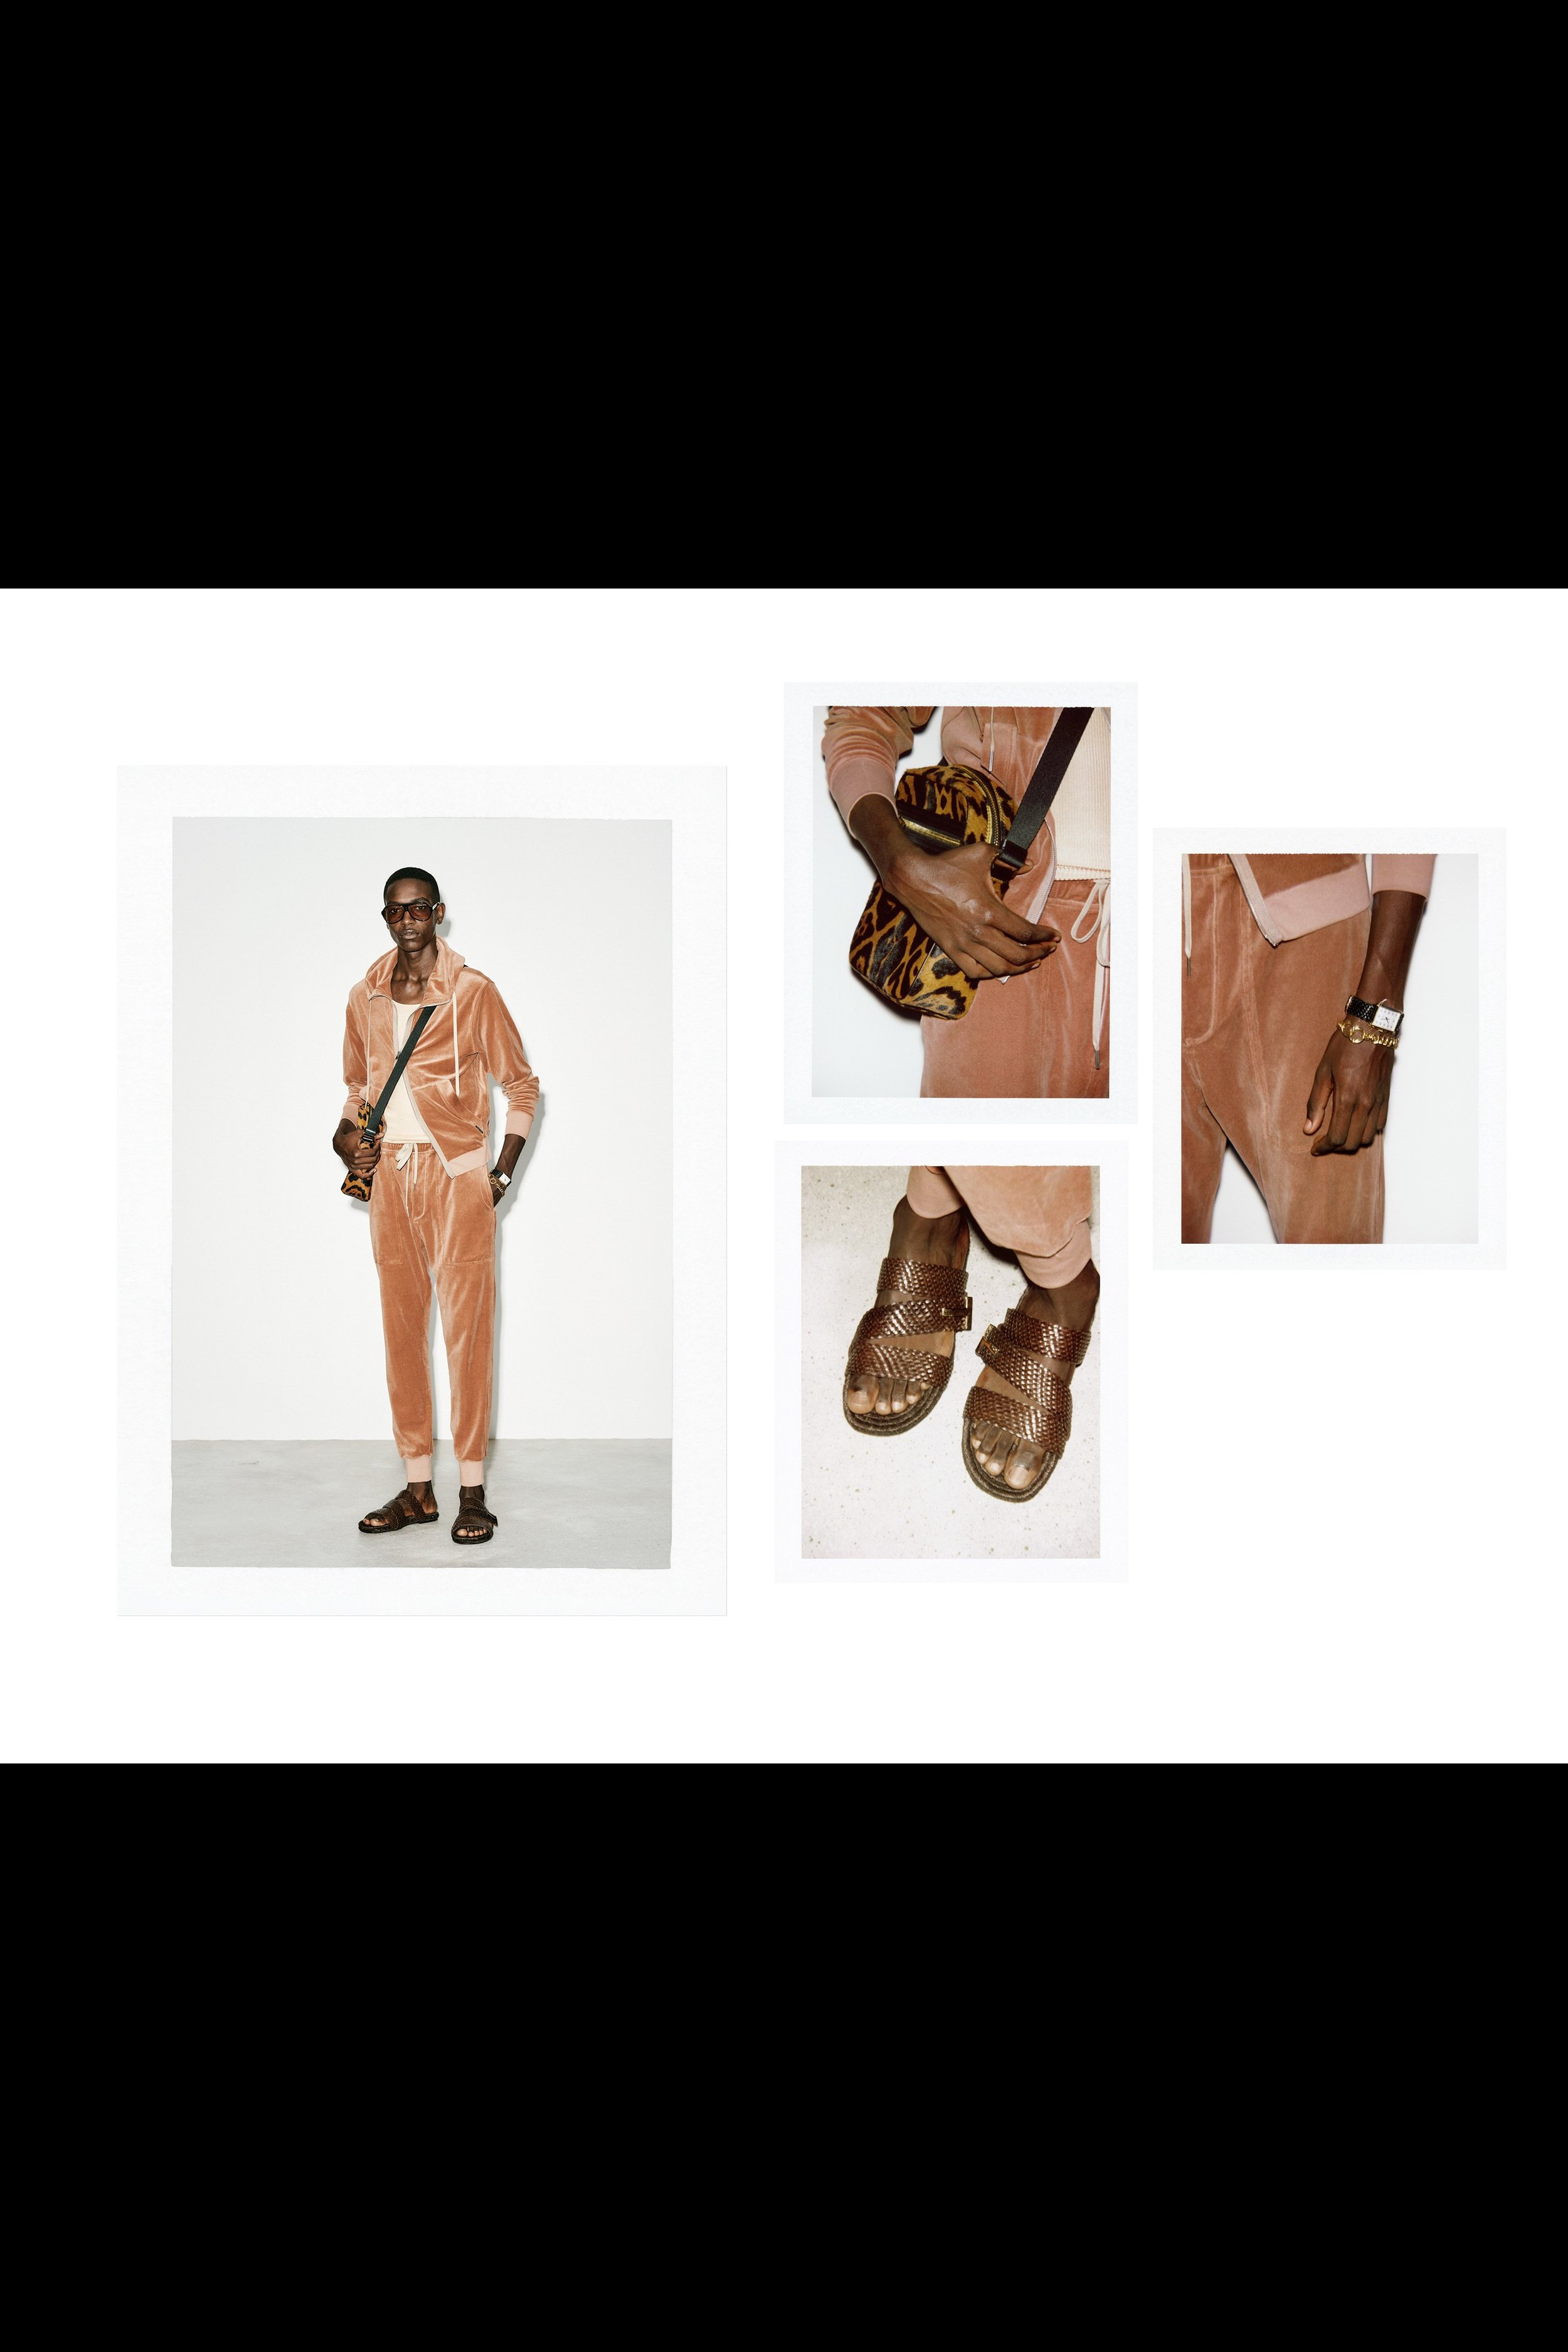 00031-Tom-Ford-vogue-menswear-spring-2019-pr.jpg